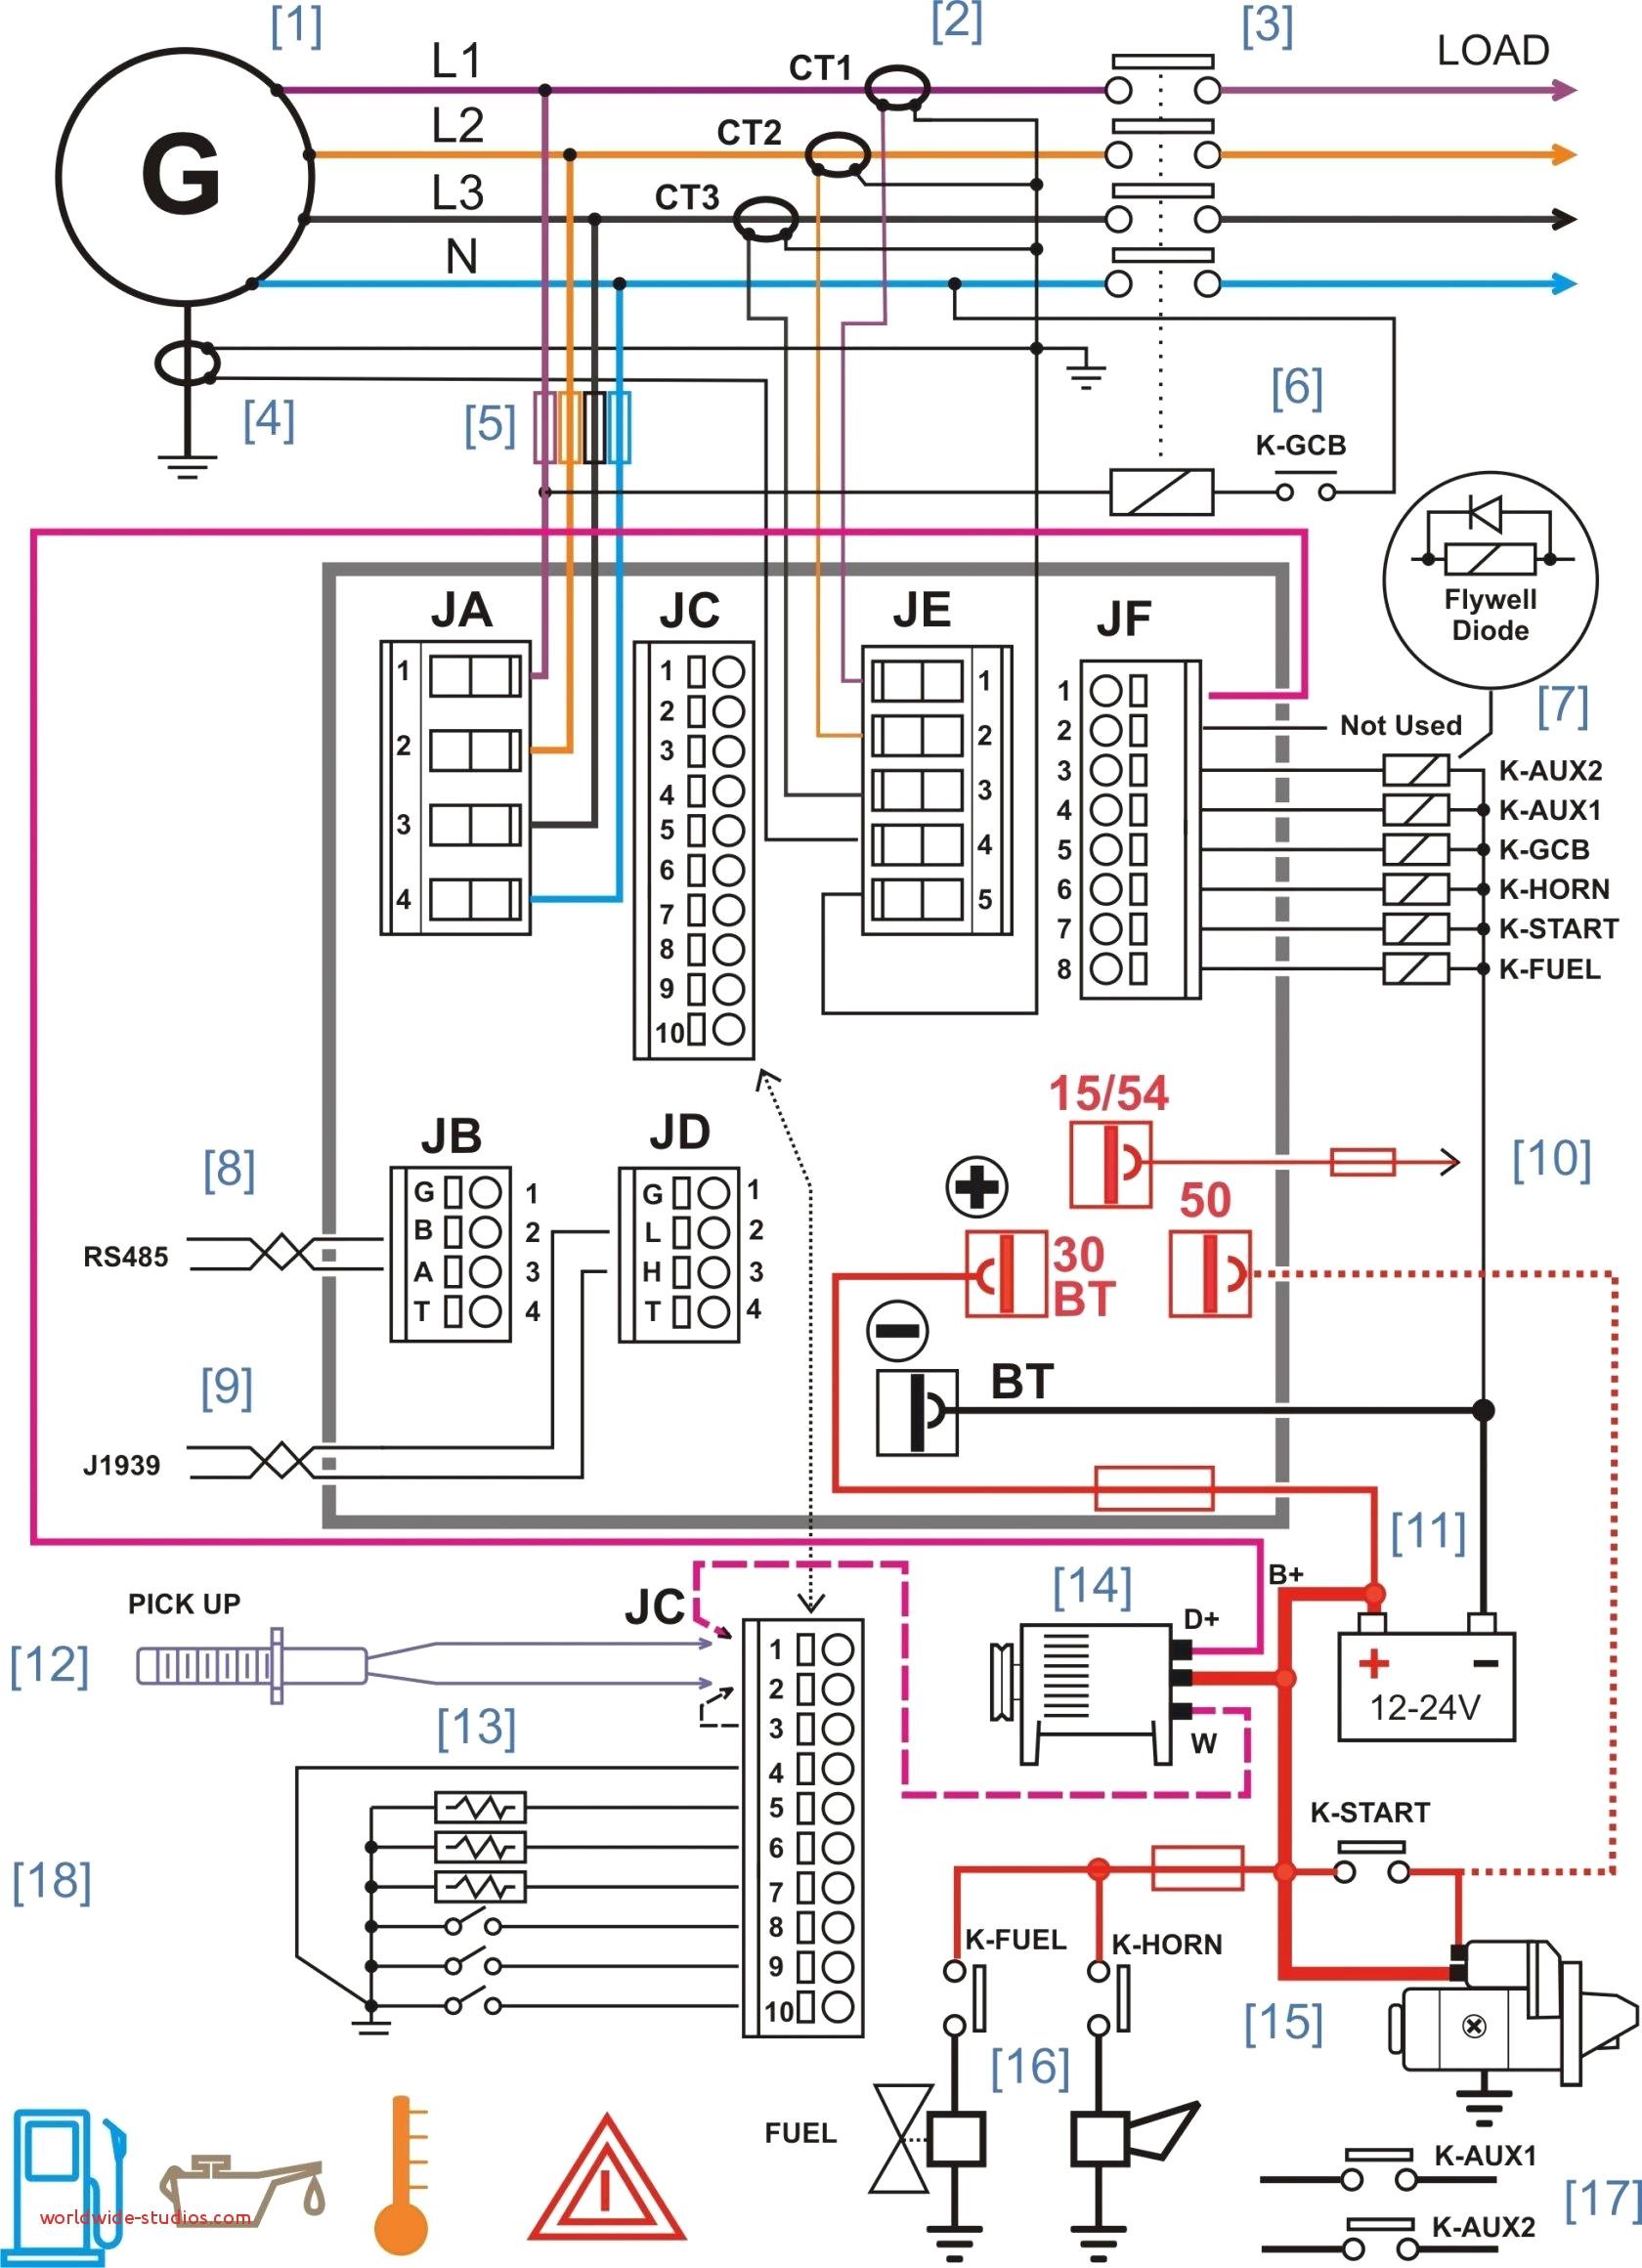 solar panel wiring diagram Download-post Top Result Unique Diy solar Panels 16-t